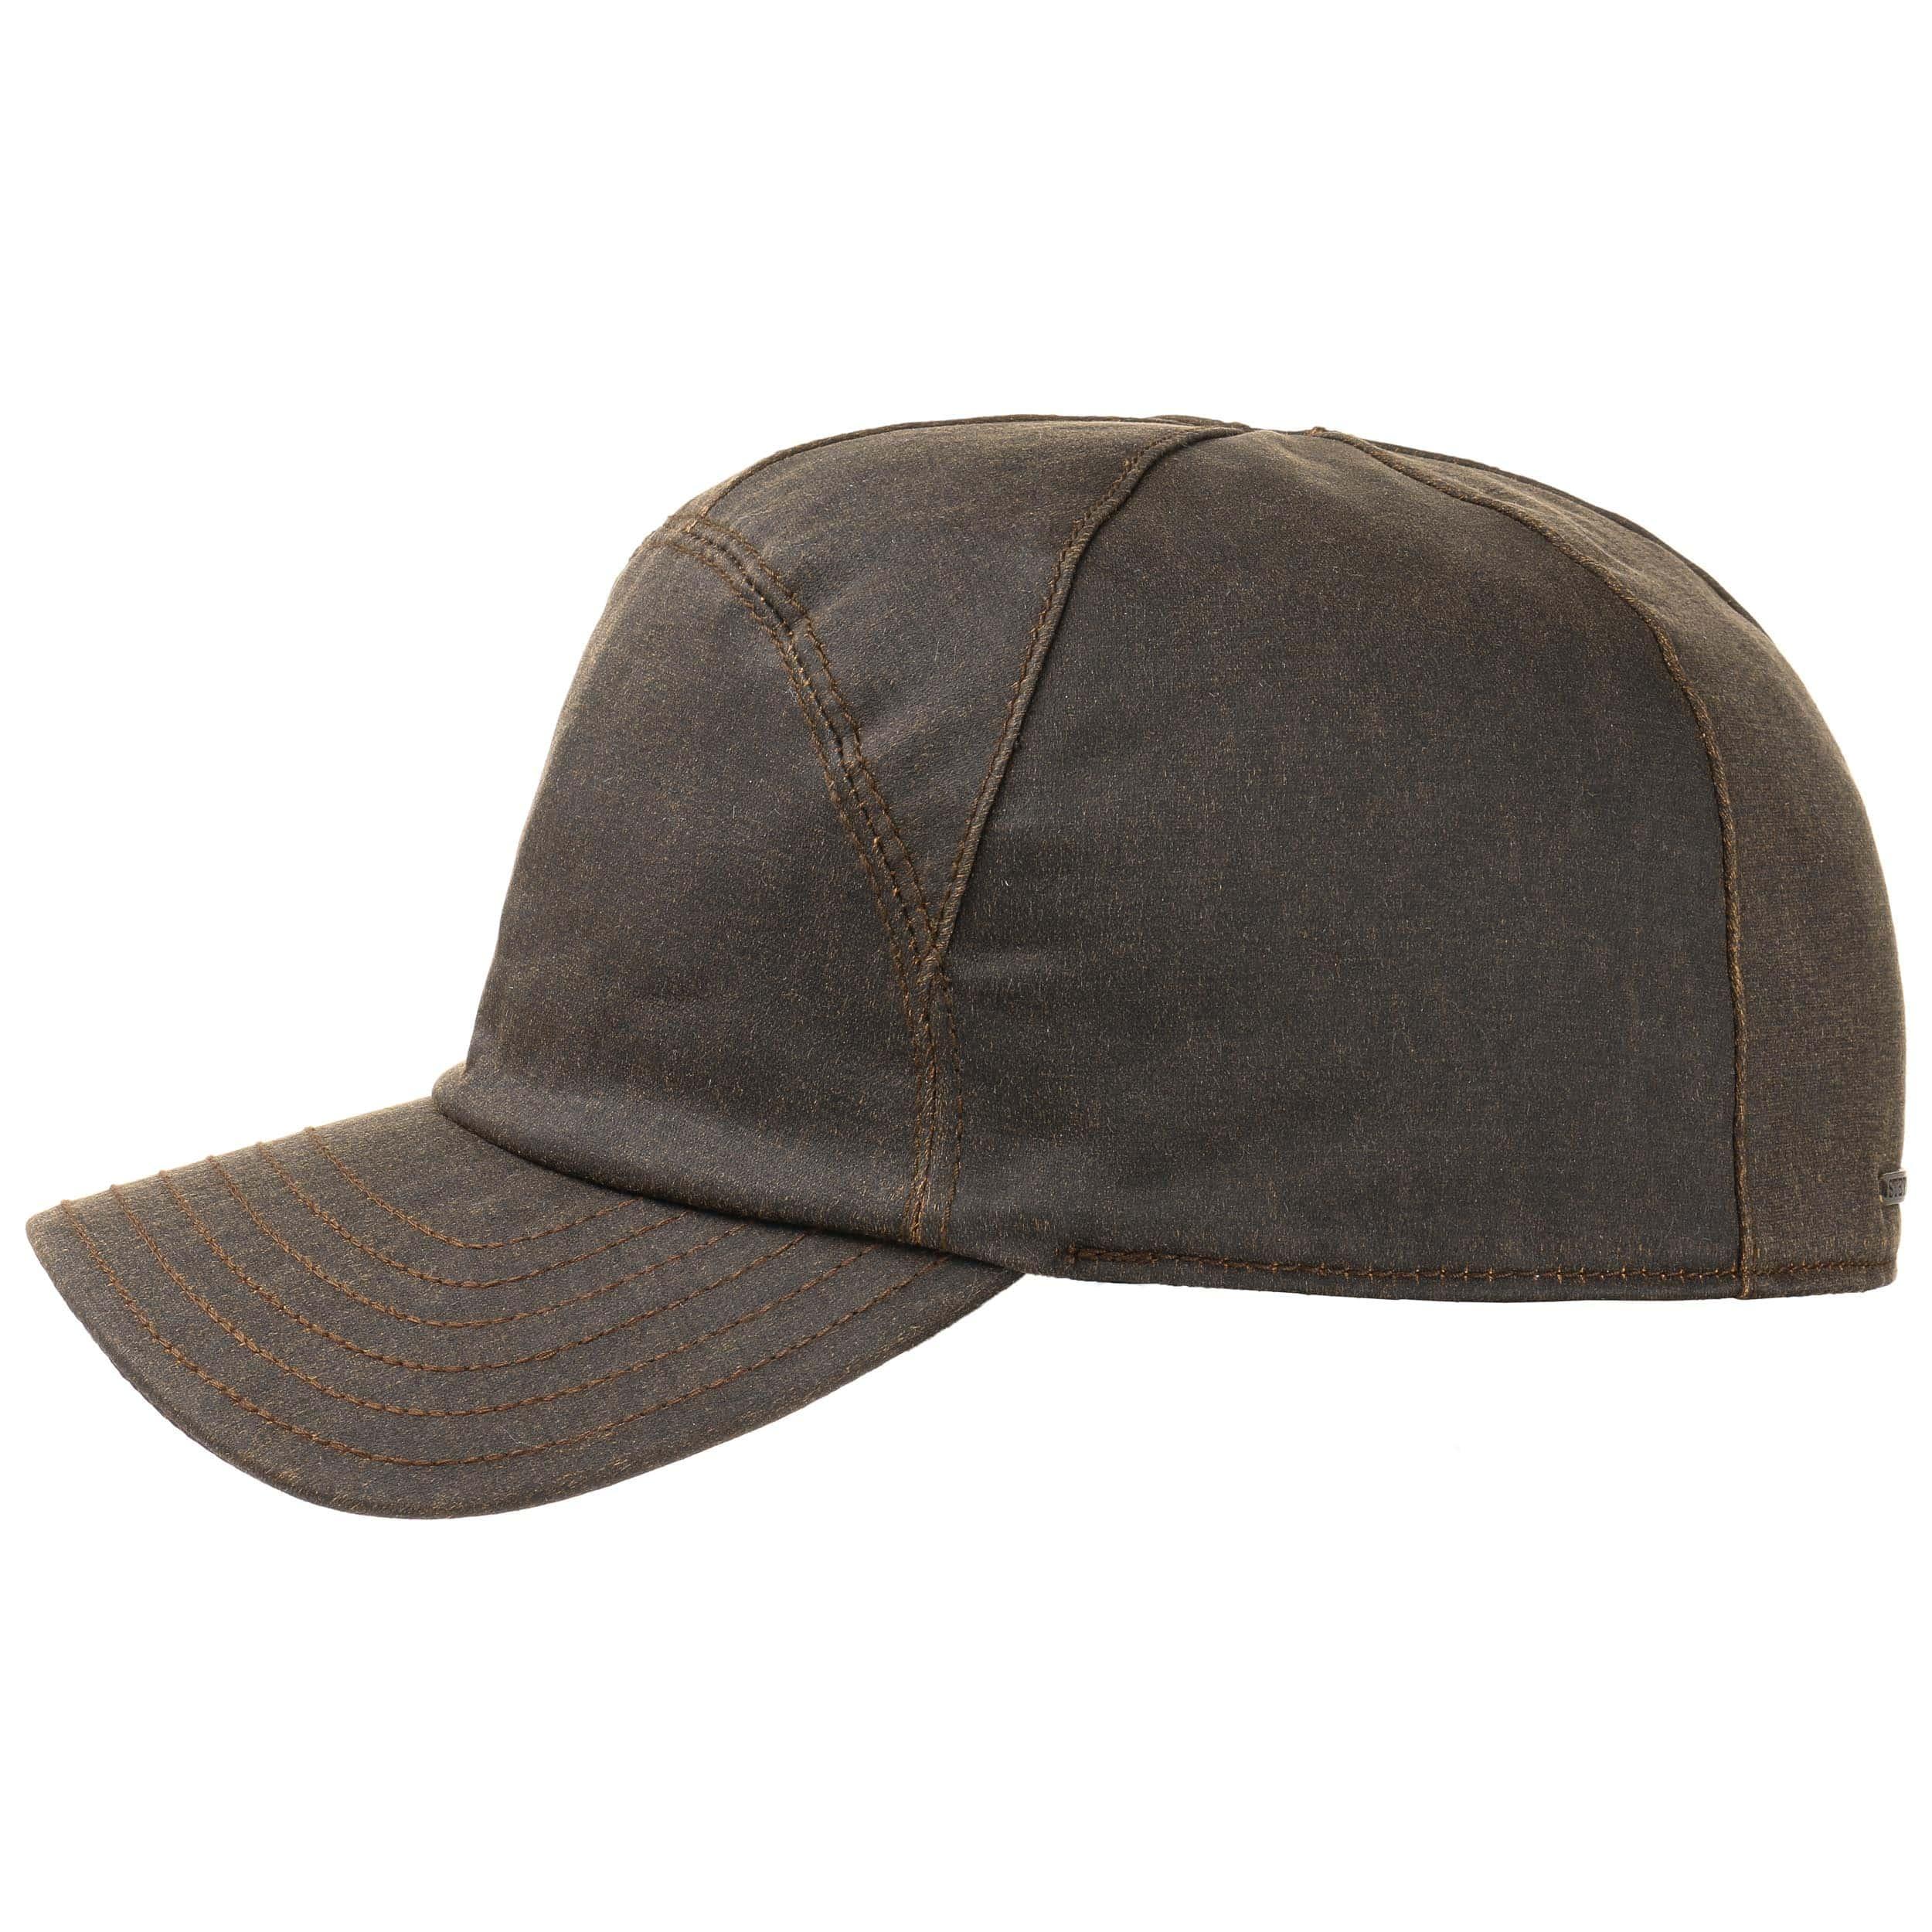 ... Maryman Earflaps Baseball Cap by Stetson - brown 5 ... bd6bca7868d